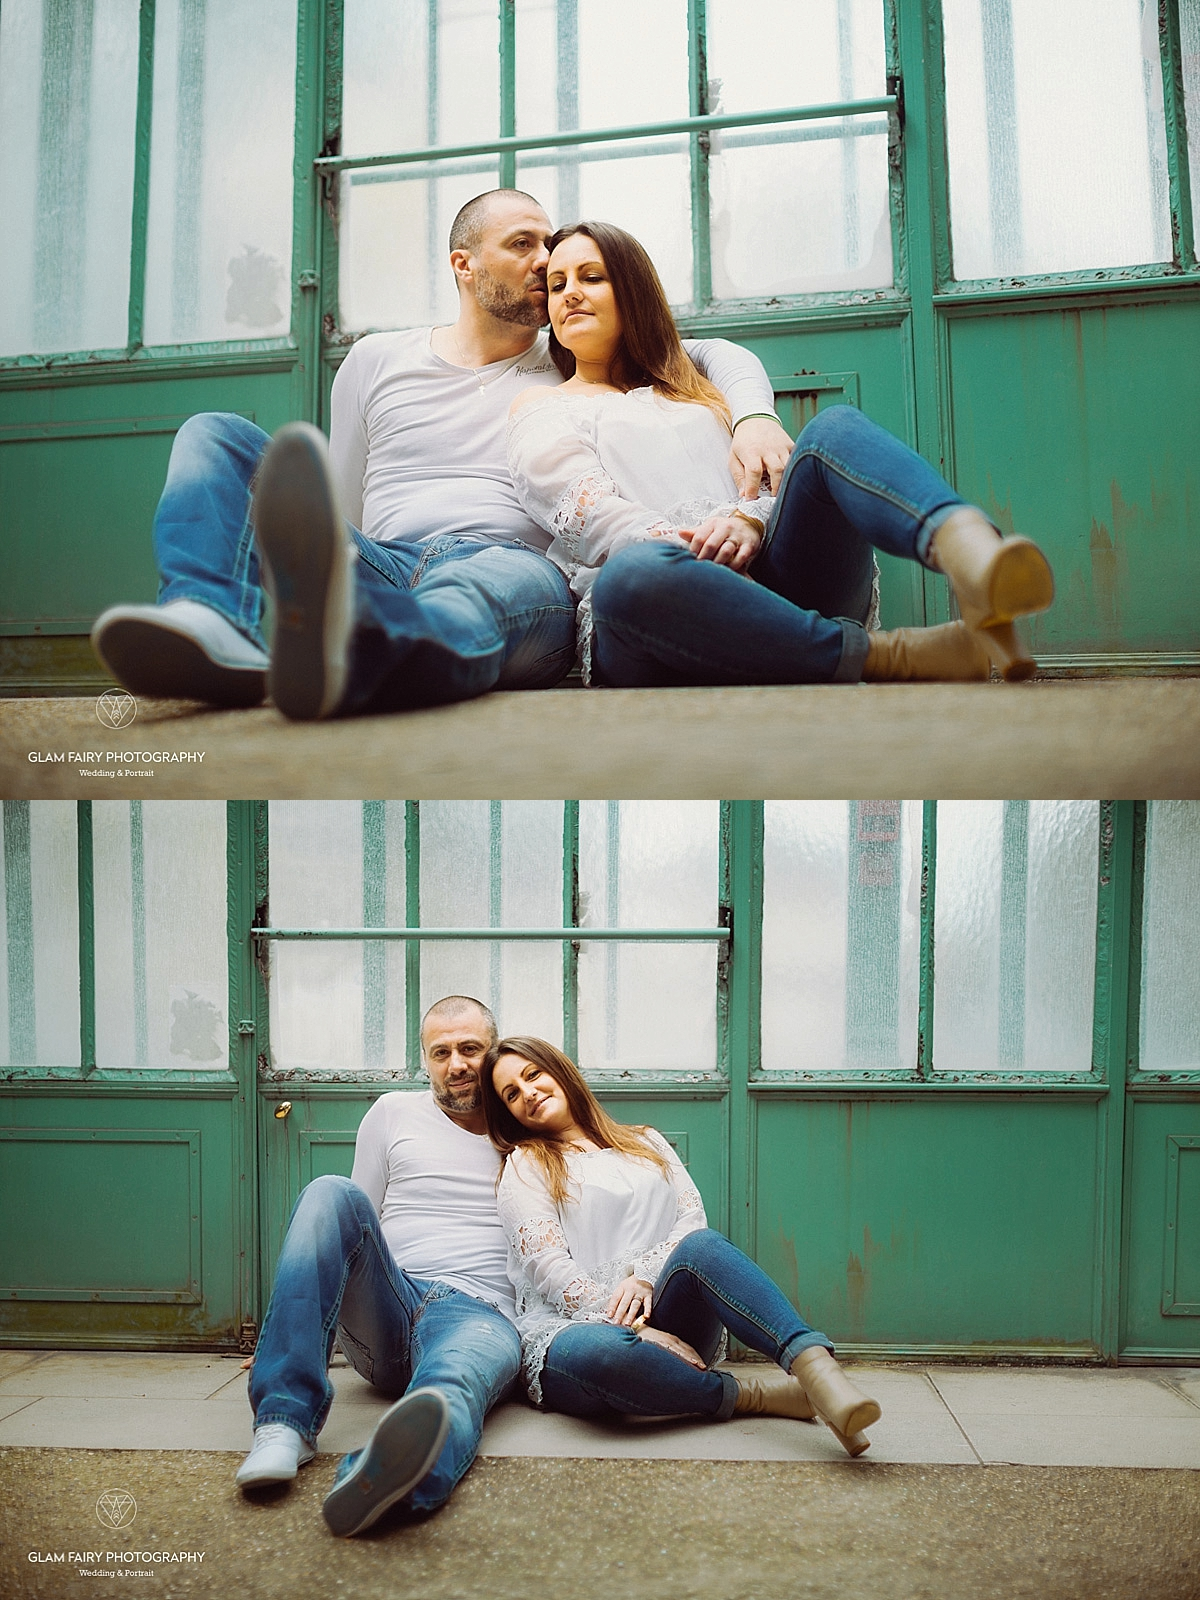 GlamFairyPhotography-seance-couple-famille-serres-auteuil-sonia_0016